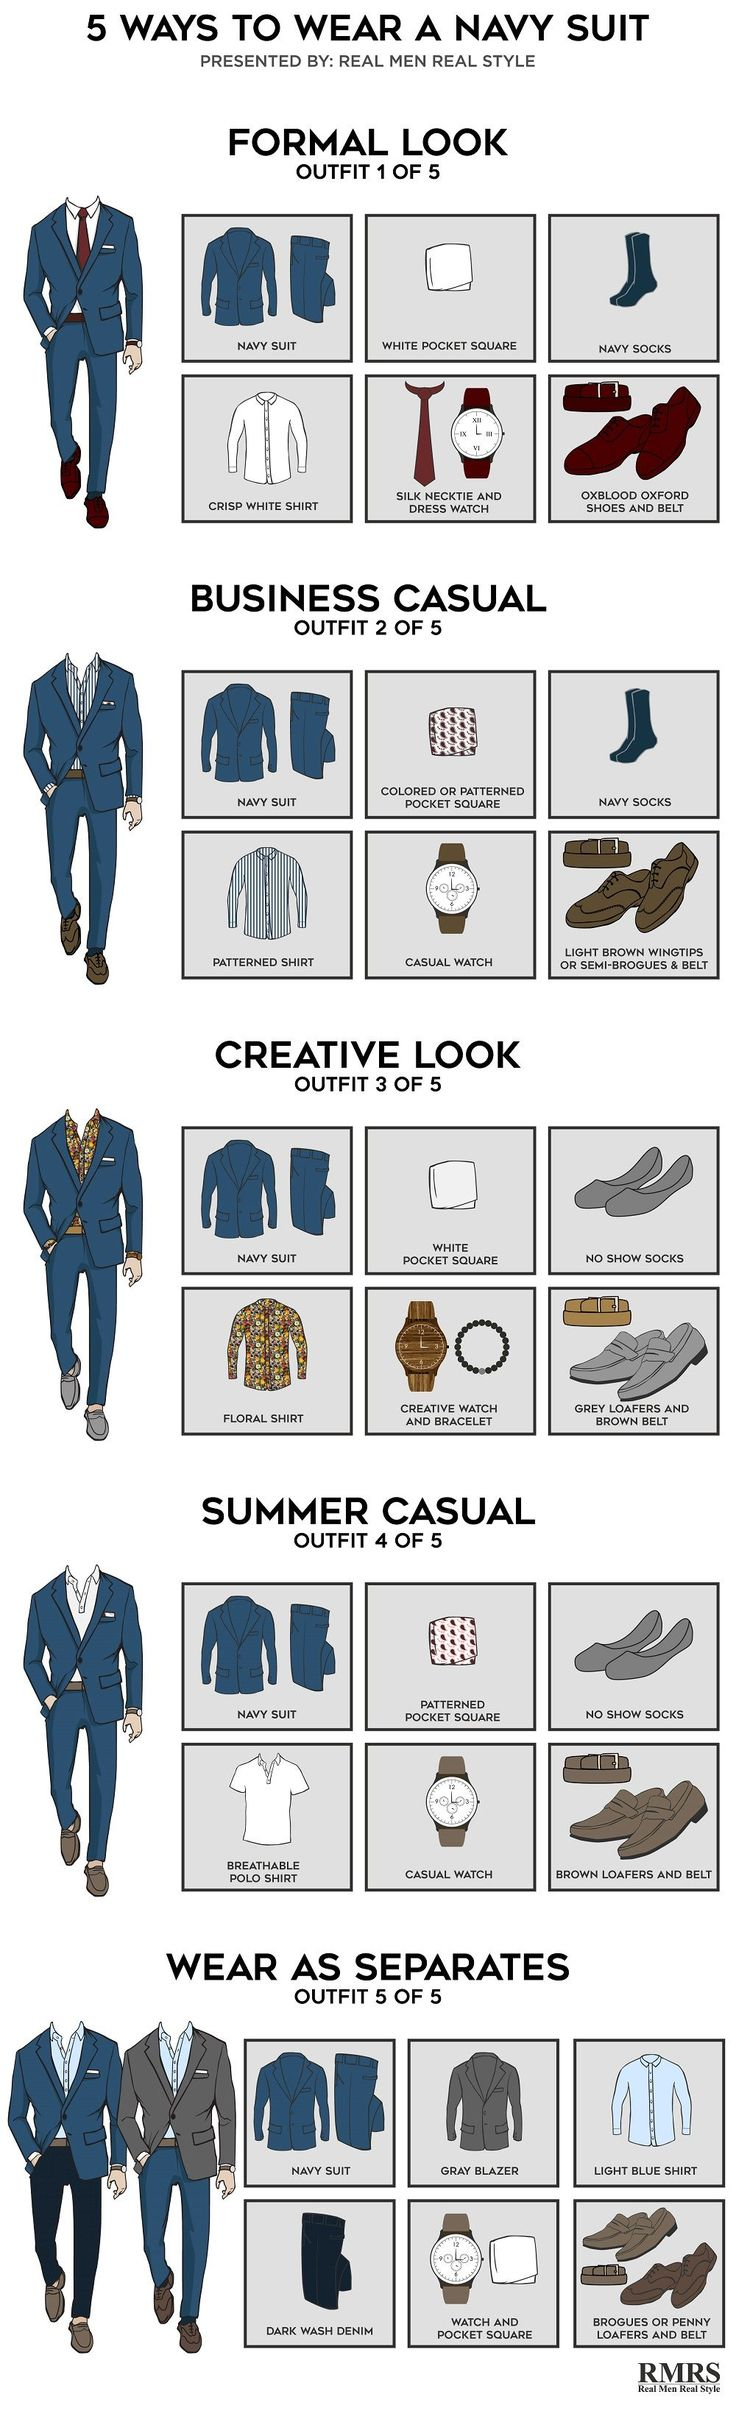 5 combinaciones que se pueden hacer con traje azul marino / 5 Outfits From One Navy Suit – Infographic